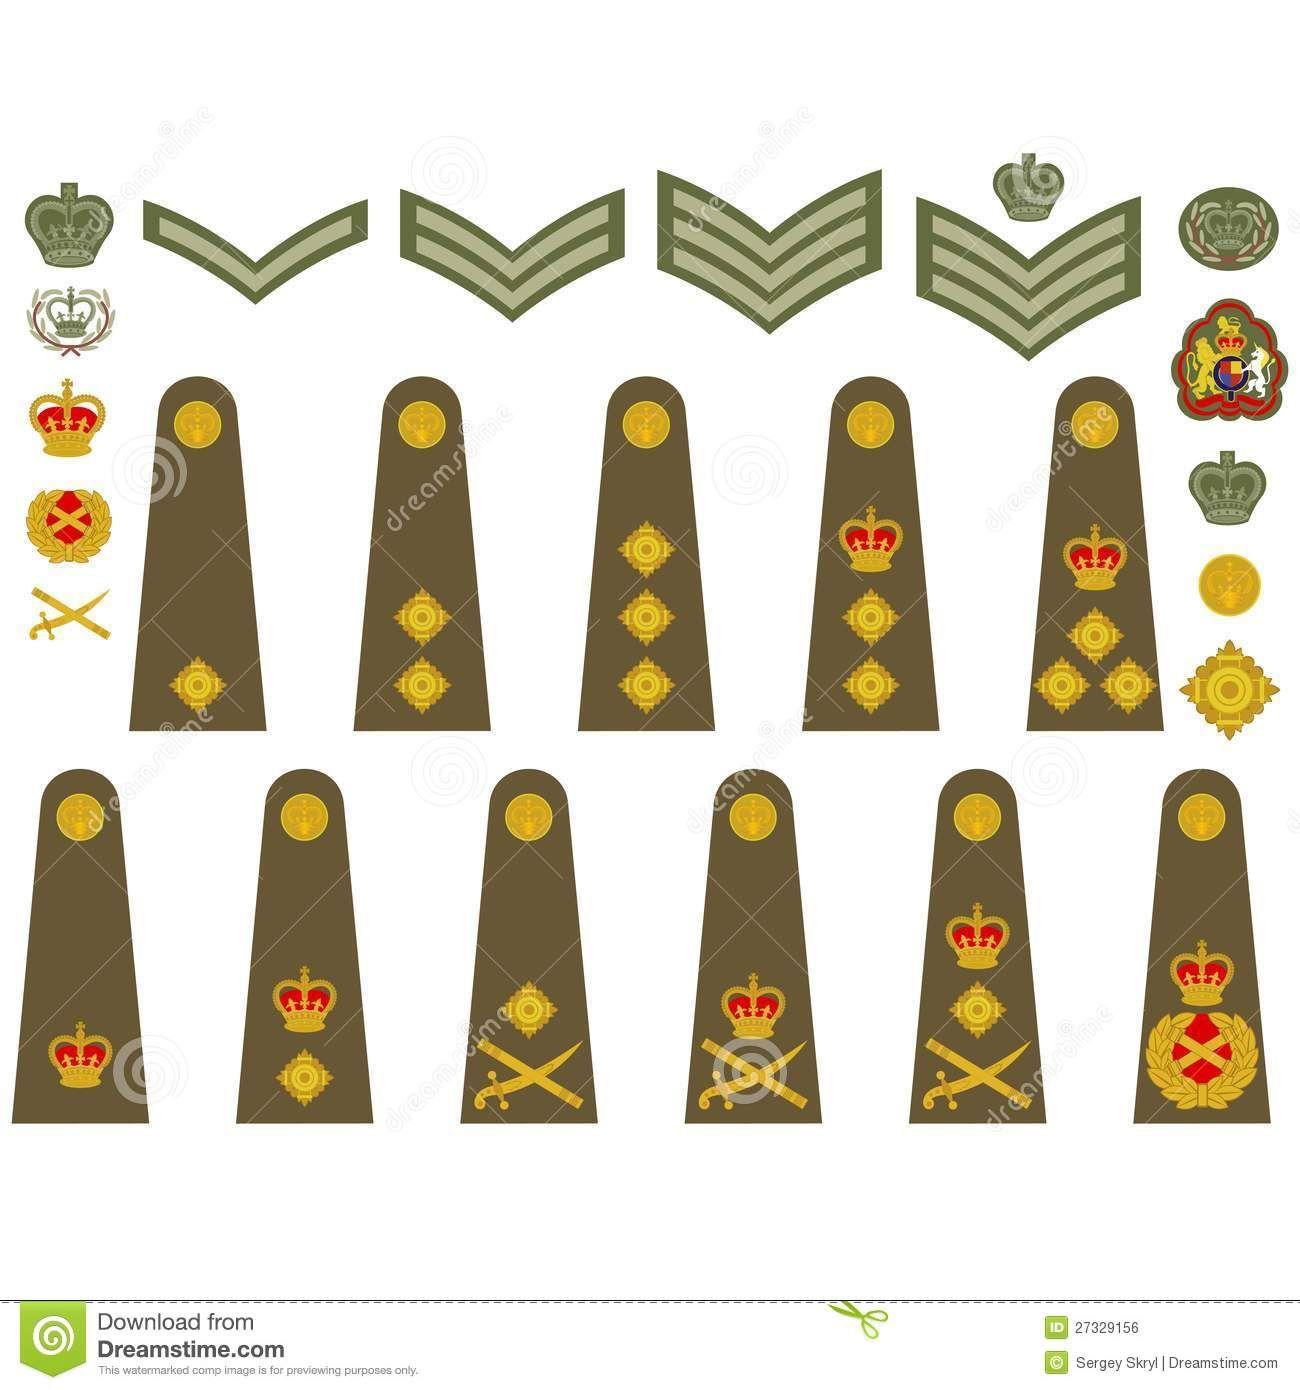 British military insignia badges recherche google grades epaulets military ranks and insignia illustration on white background biocorpaavc Images